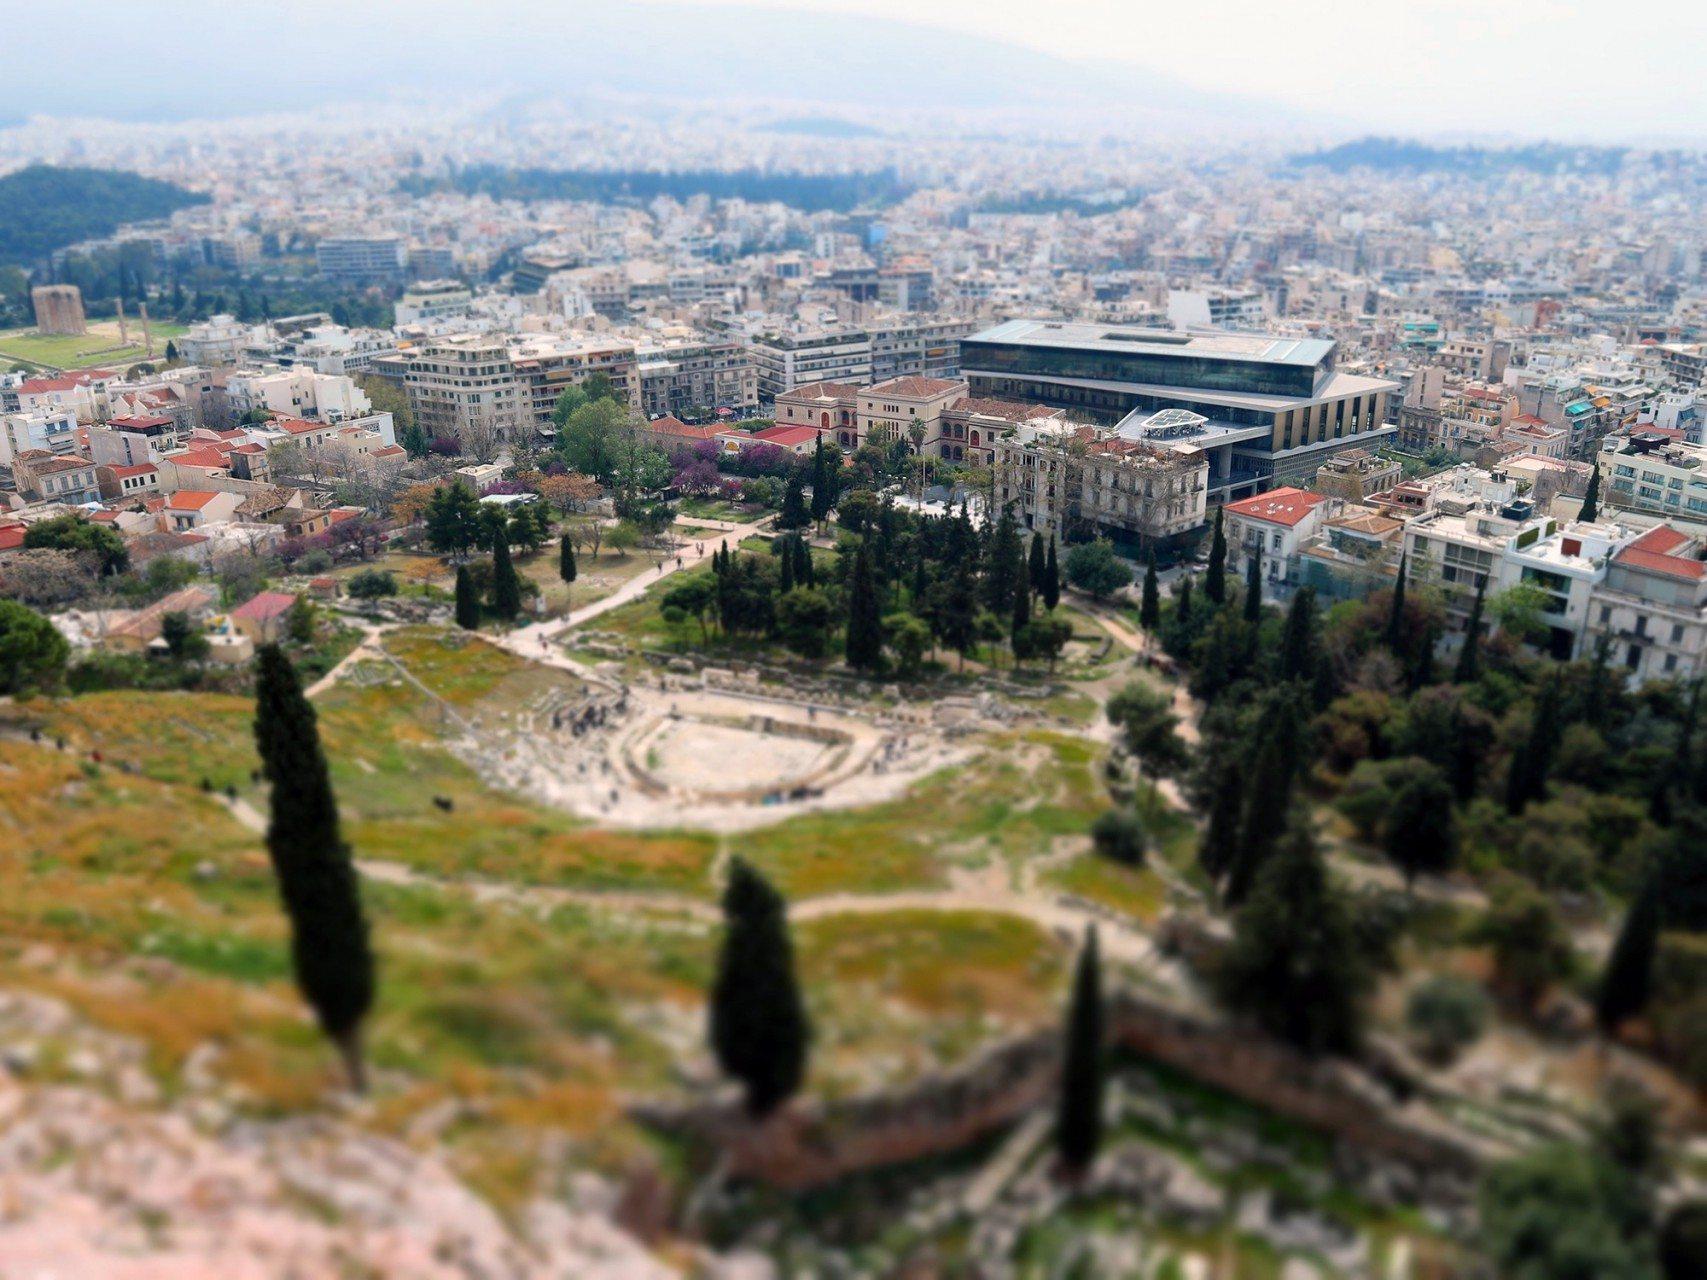 Das Akropolismuseum